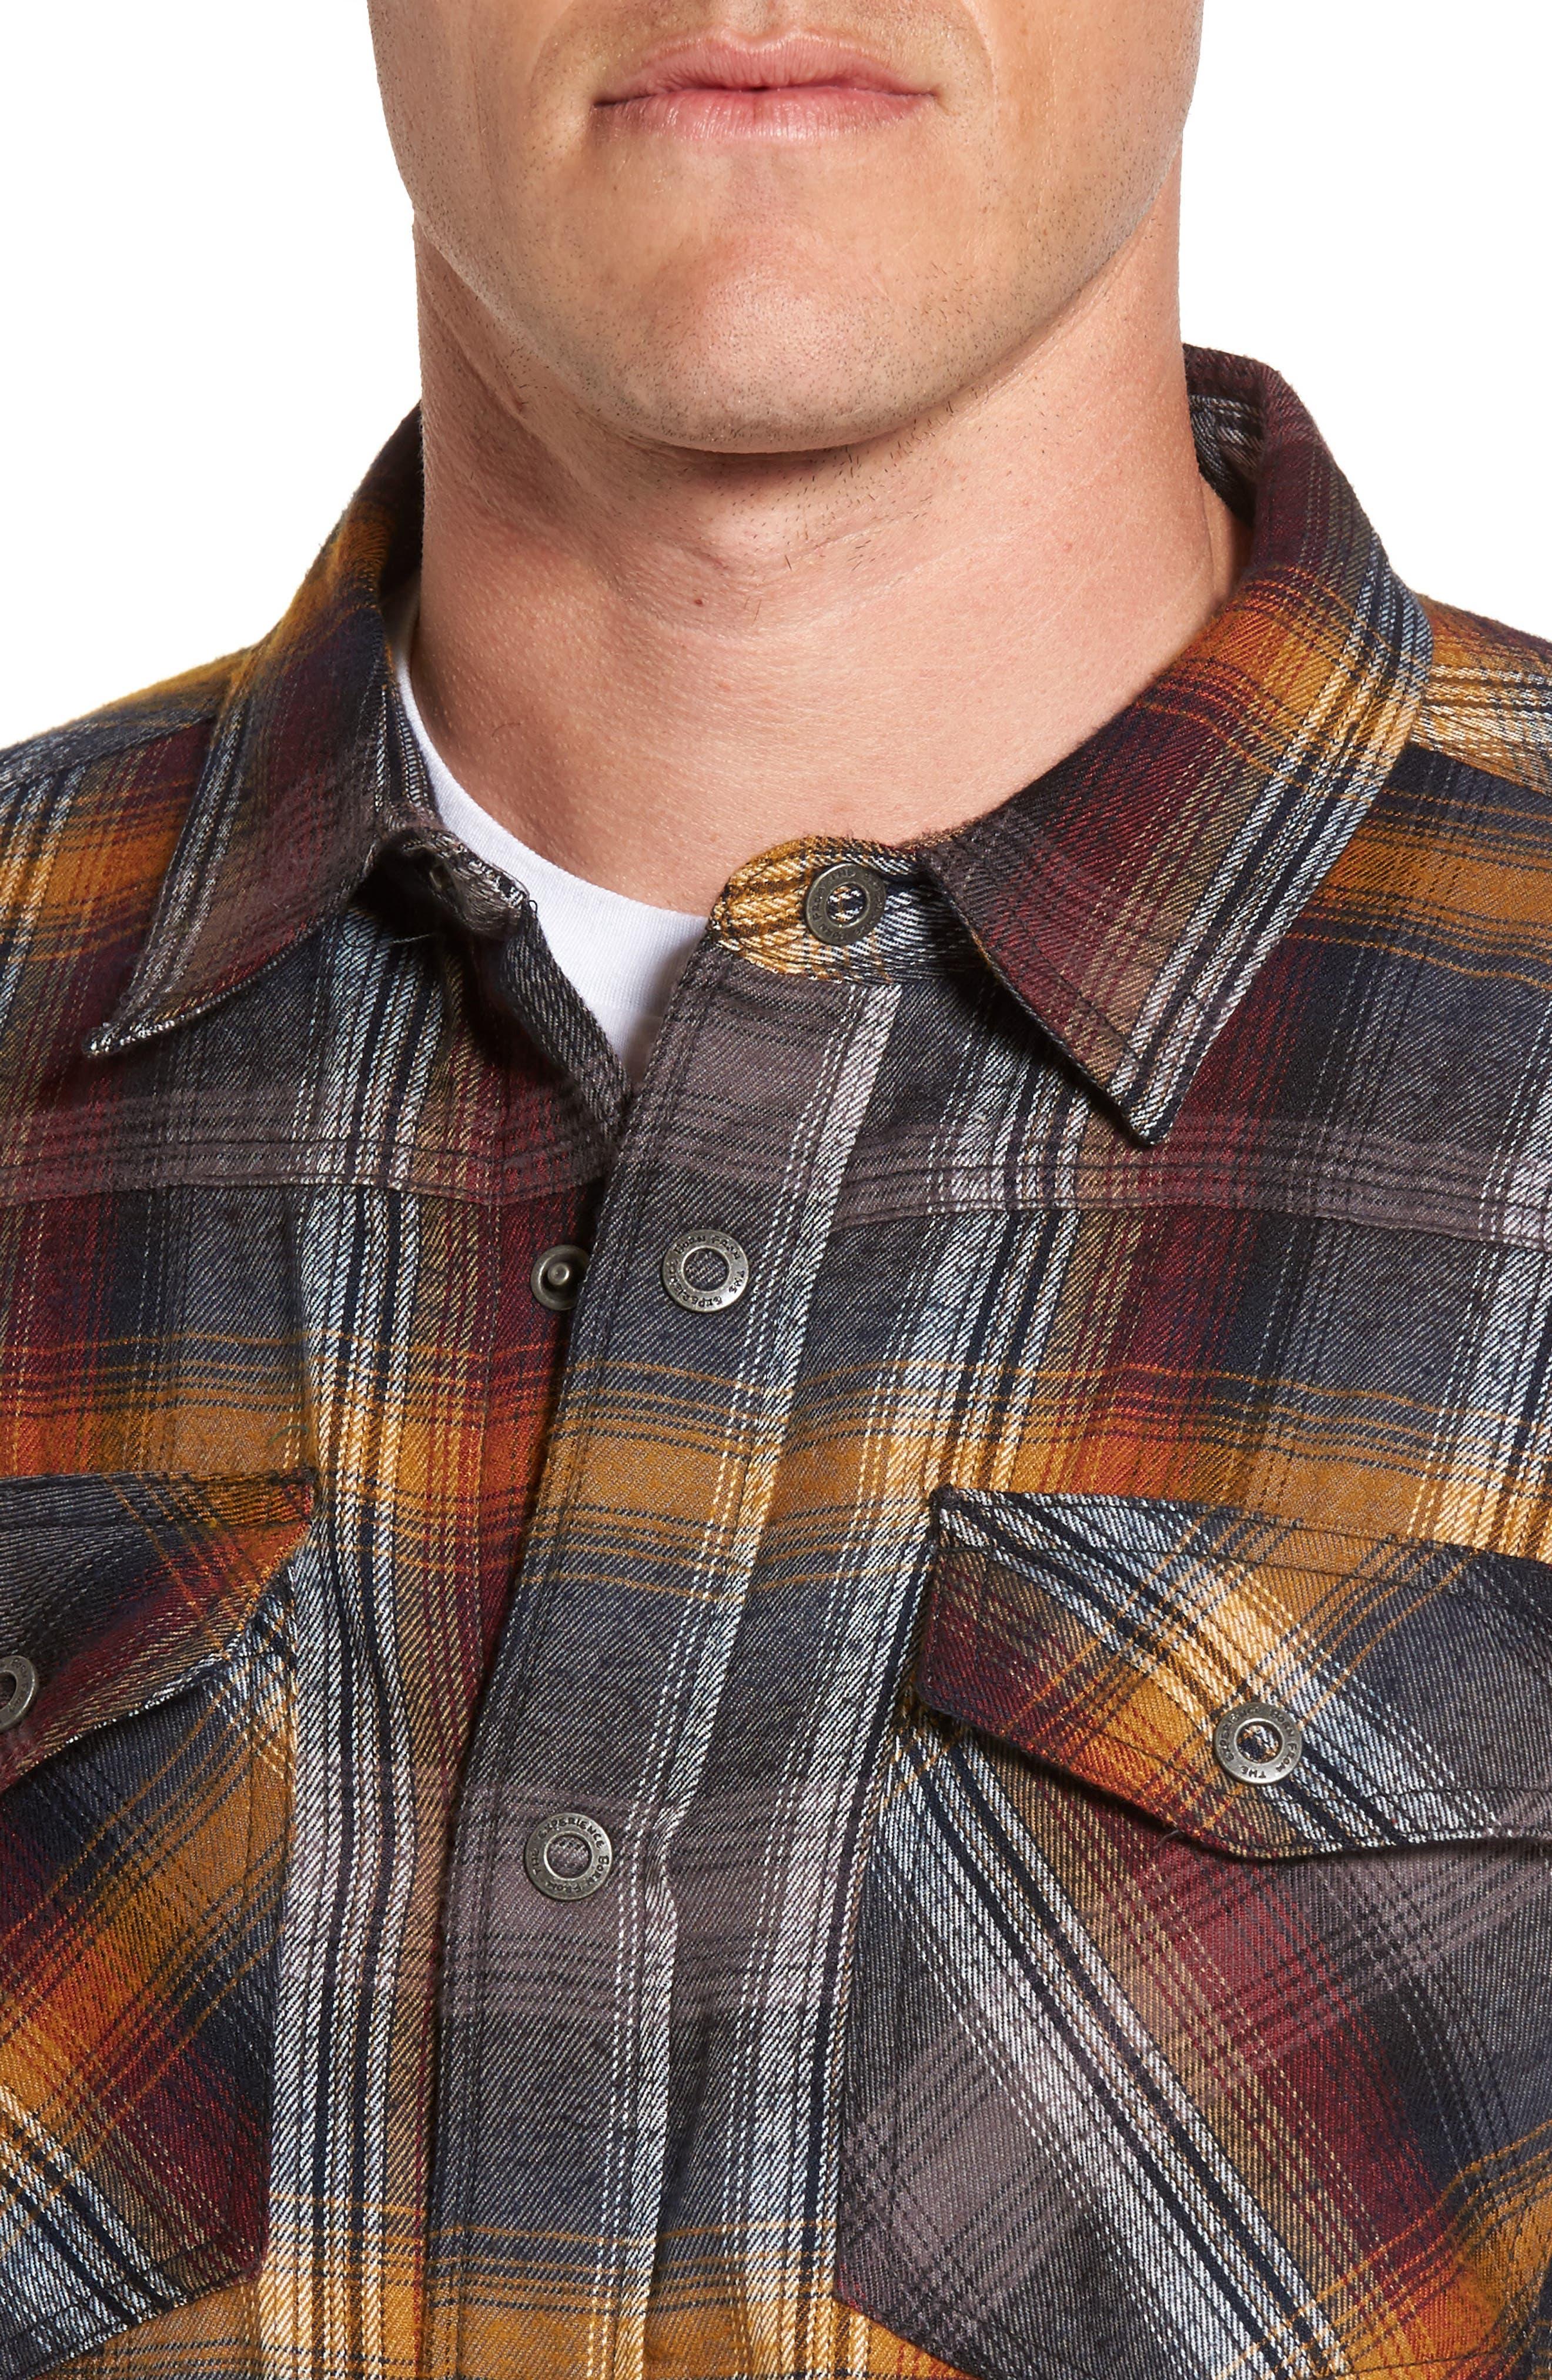 Asylum Regular Fit Plaid Shirt Jacket,                             Alternate thumbnail 4, color,                             001